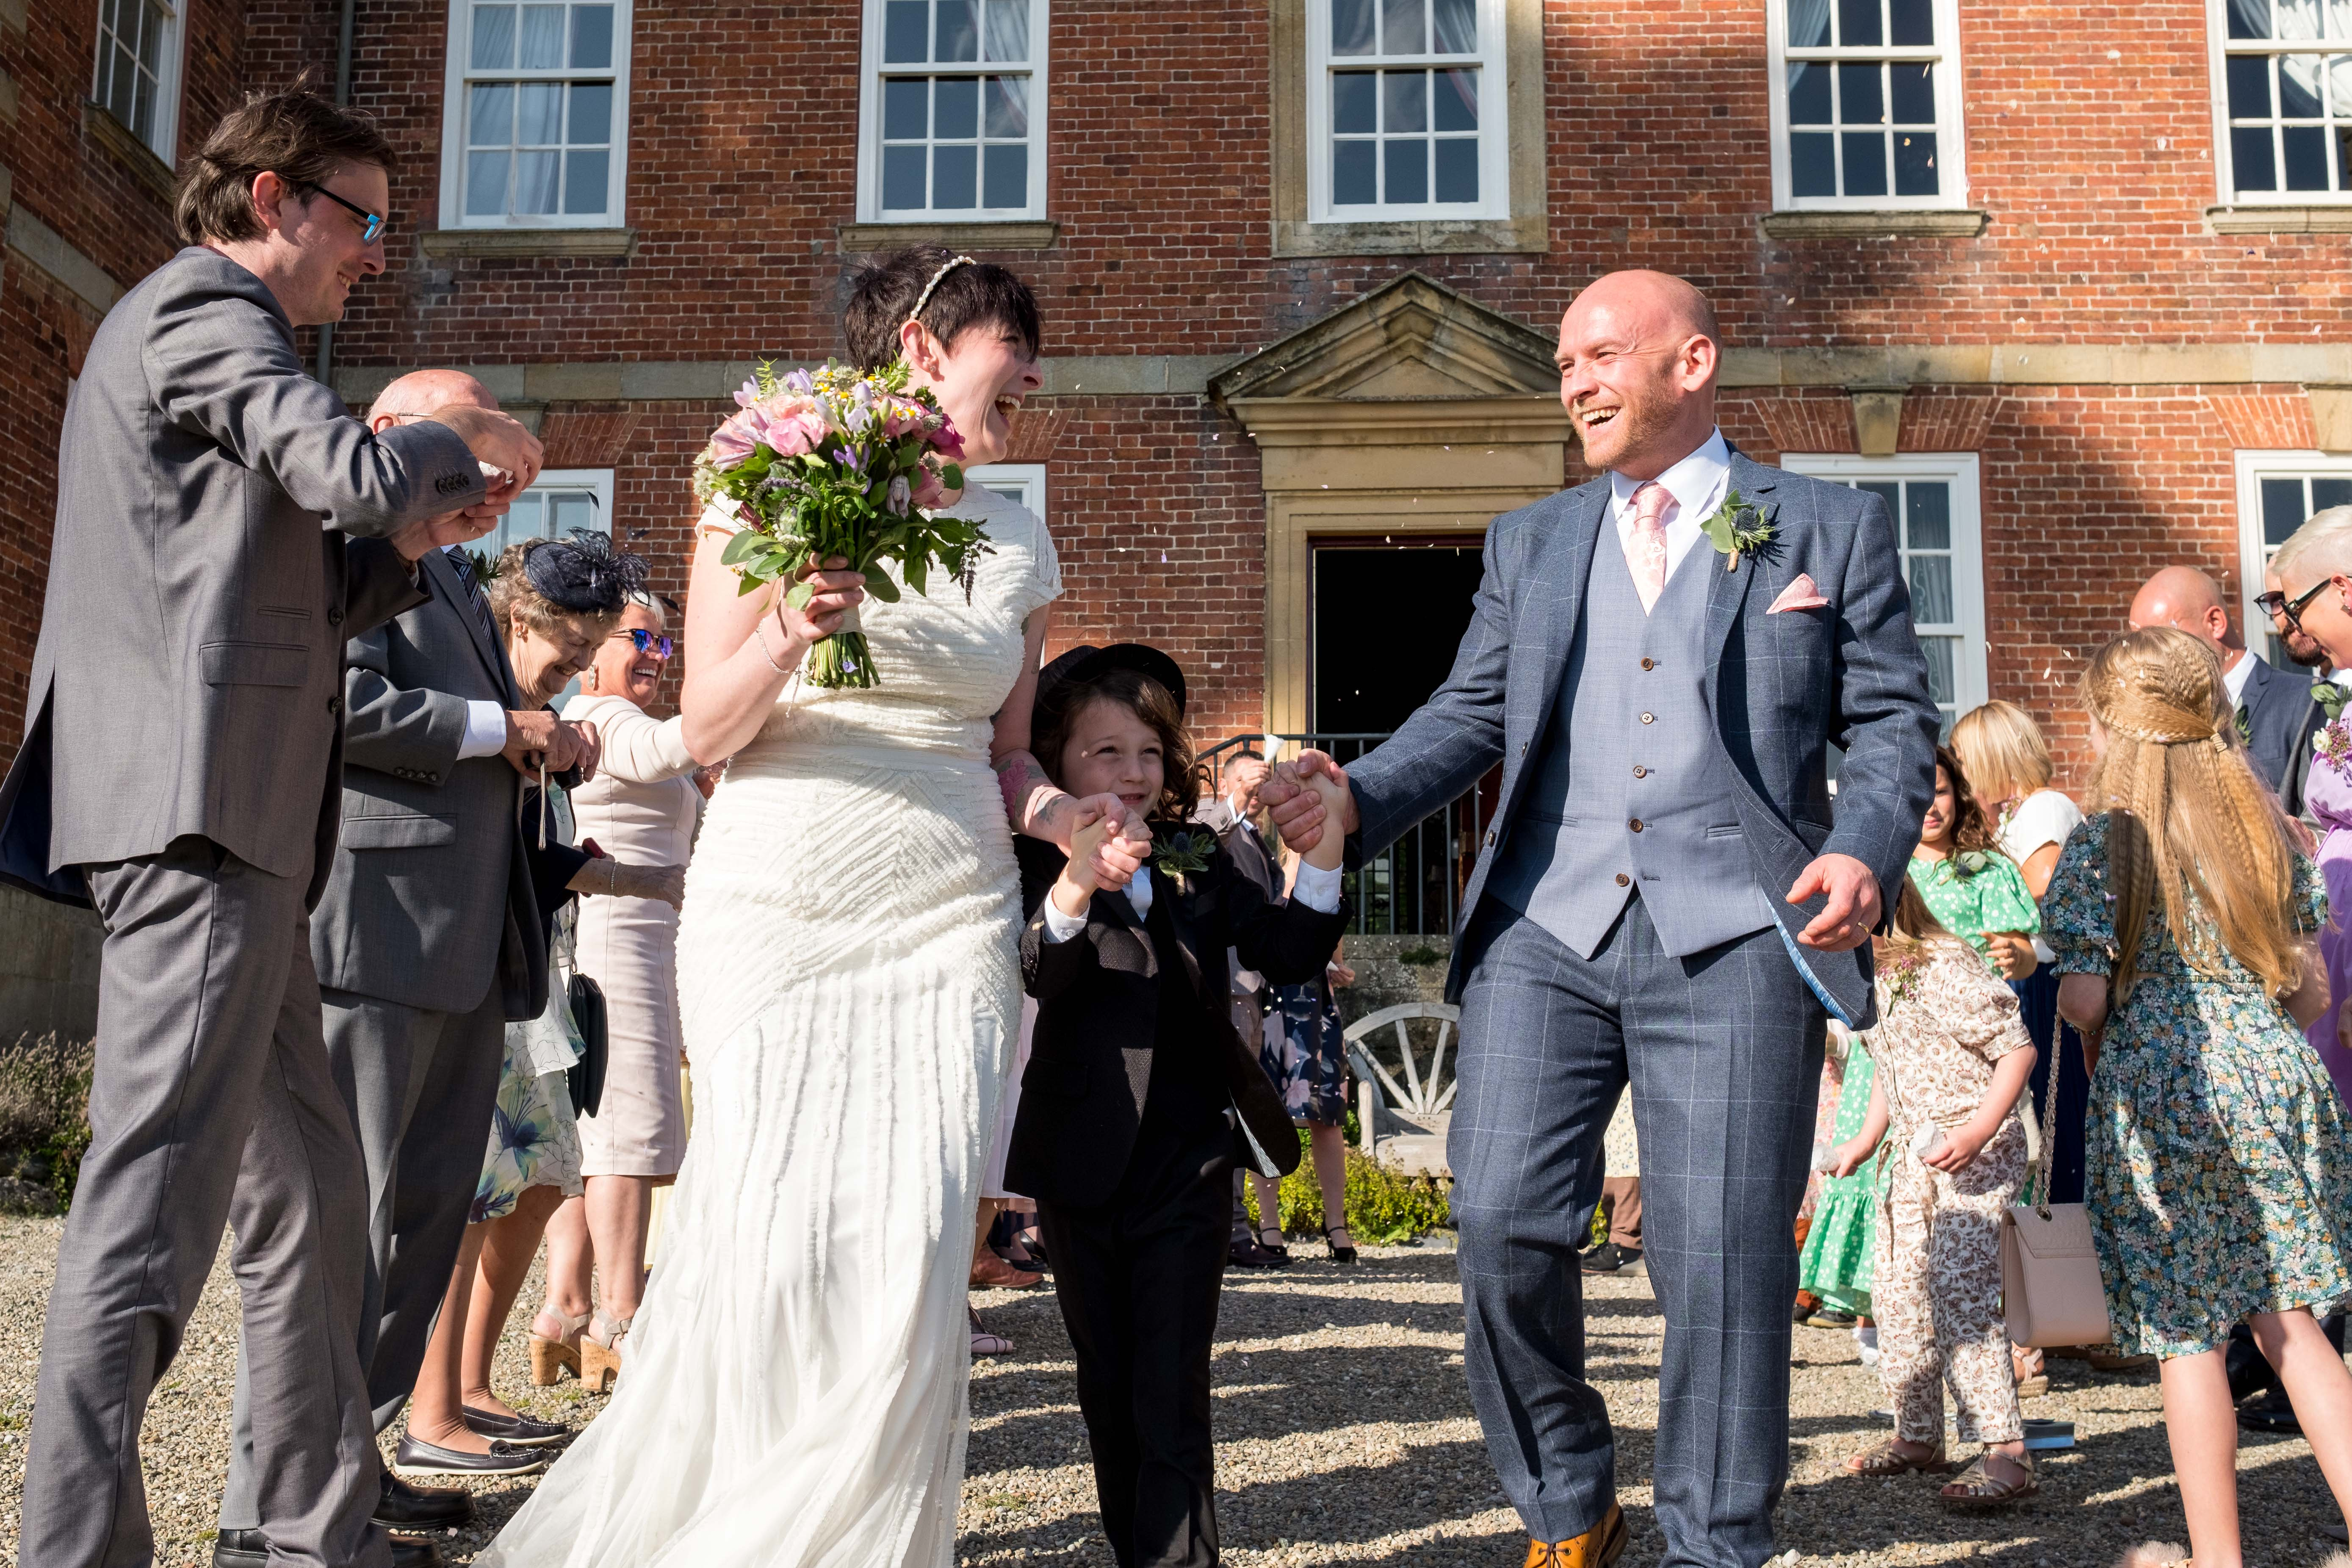 Happy wedding vibes as Rachel and Paul